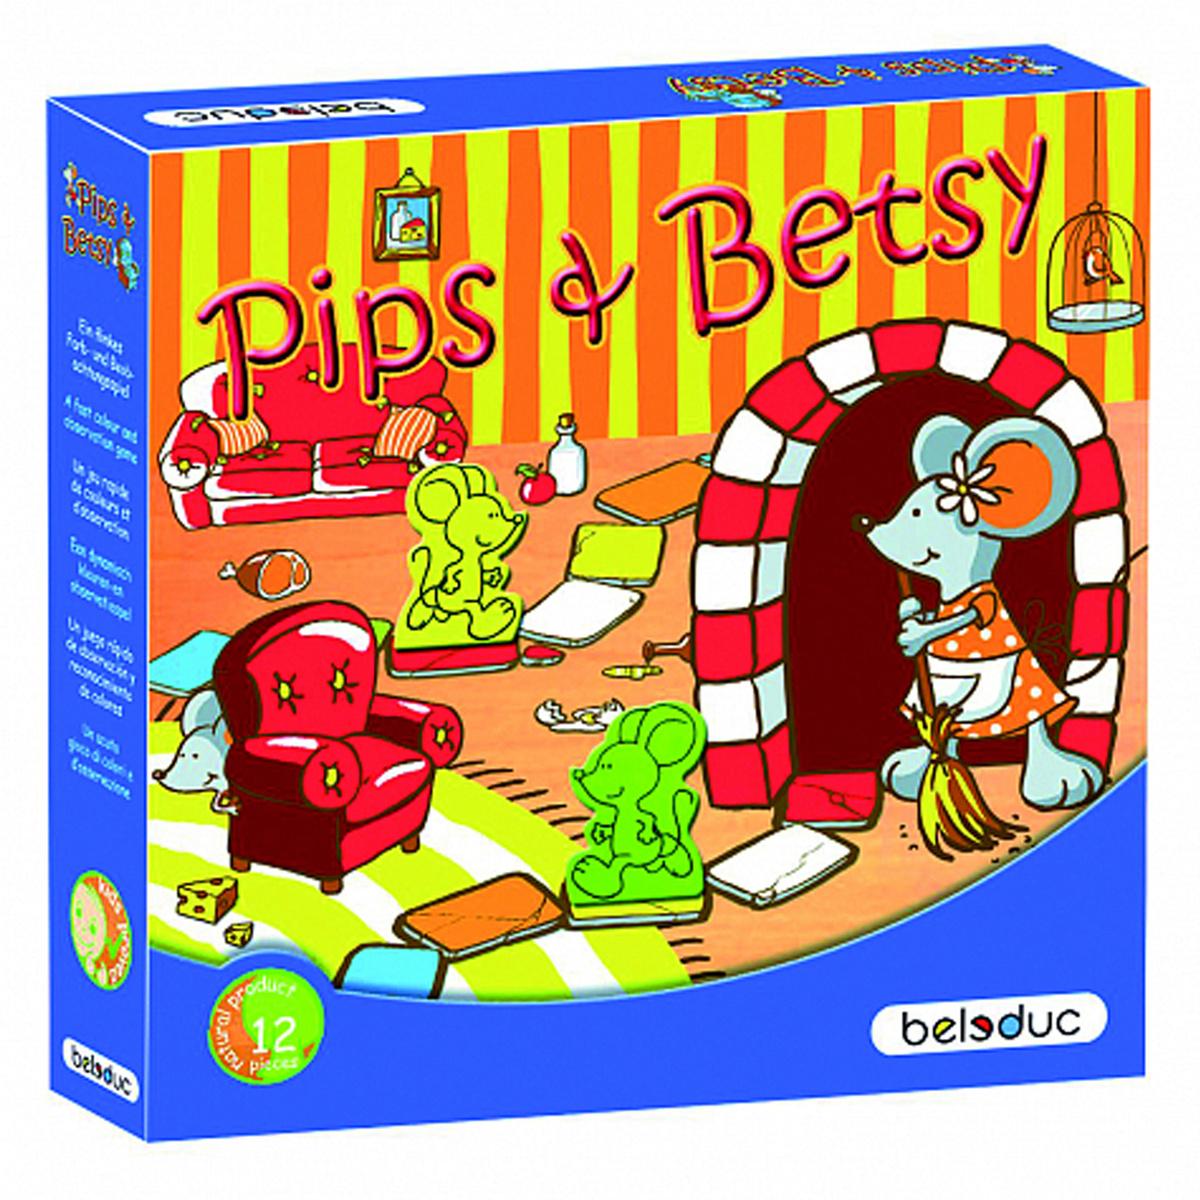 "Развивающая игра Beleduc ""Пипс и Бетси"" (340x340) #1"